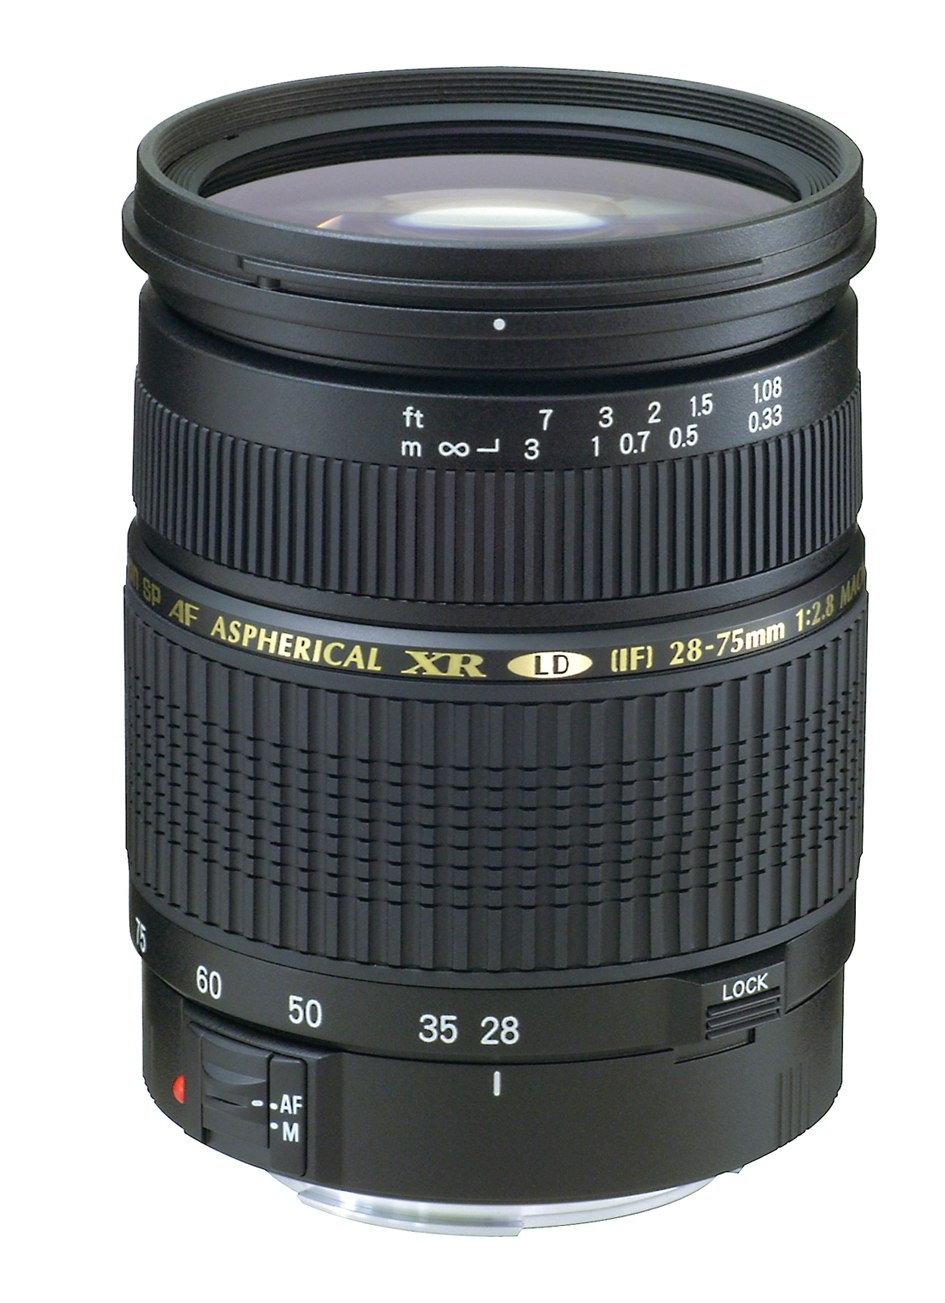 Tamron SP 28-75mm F2.8 XR Di LD [IF] Macro para Canon Nikon o Sony